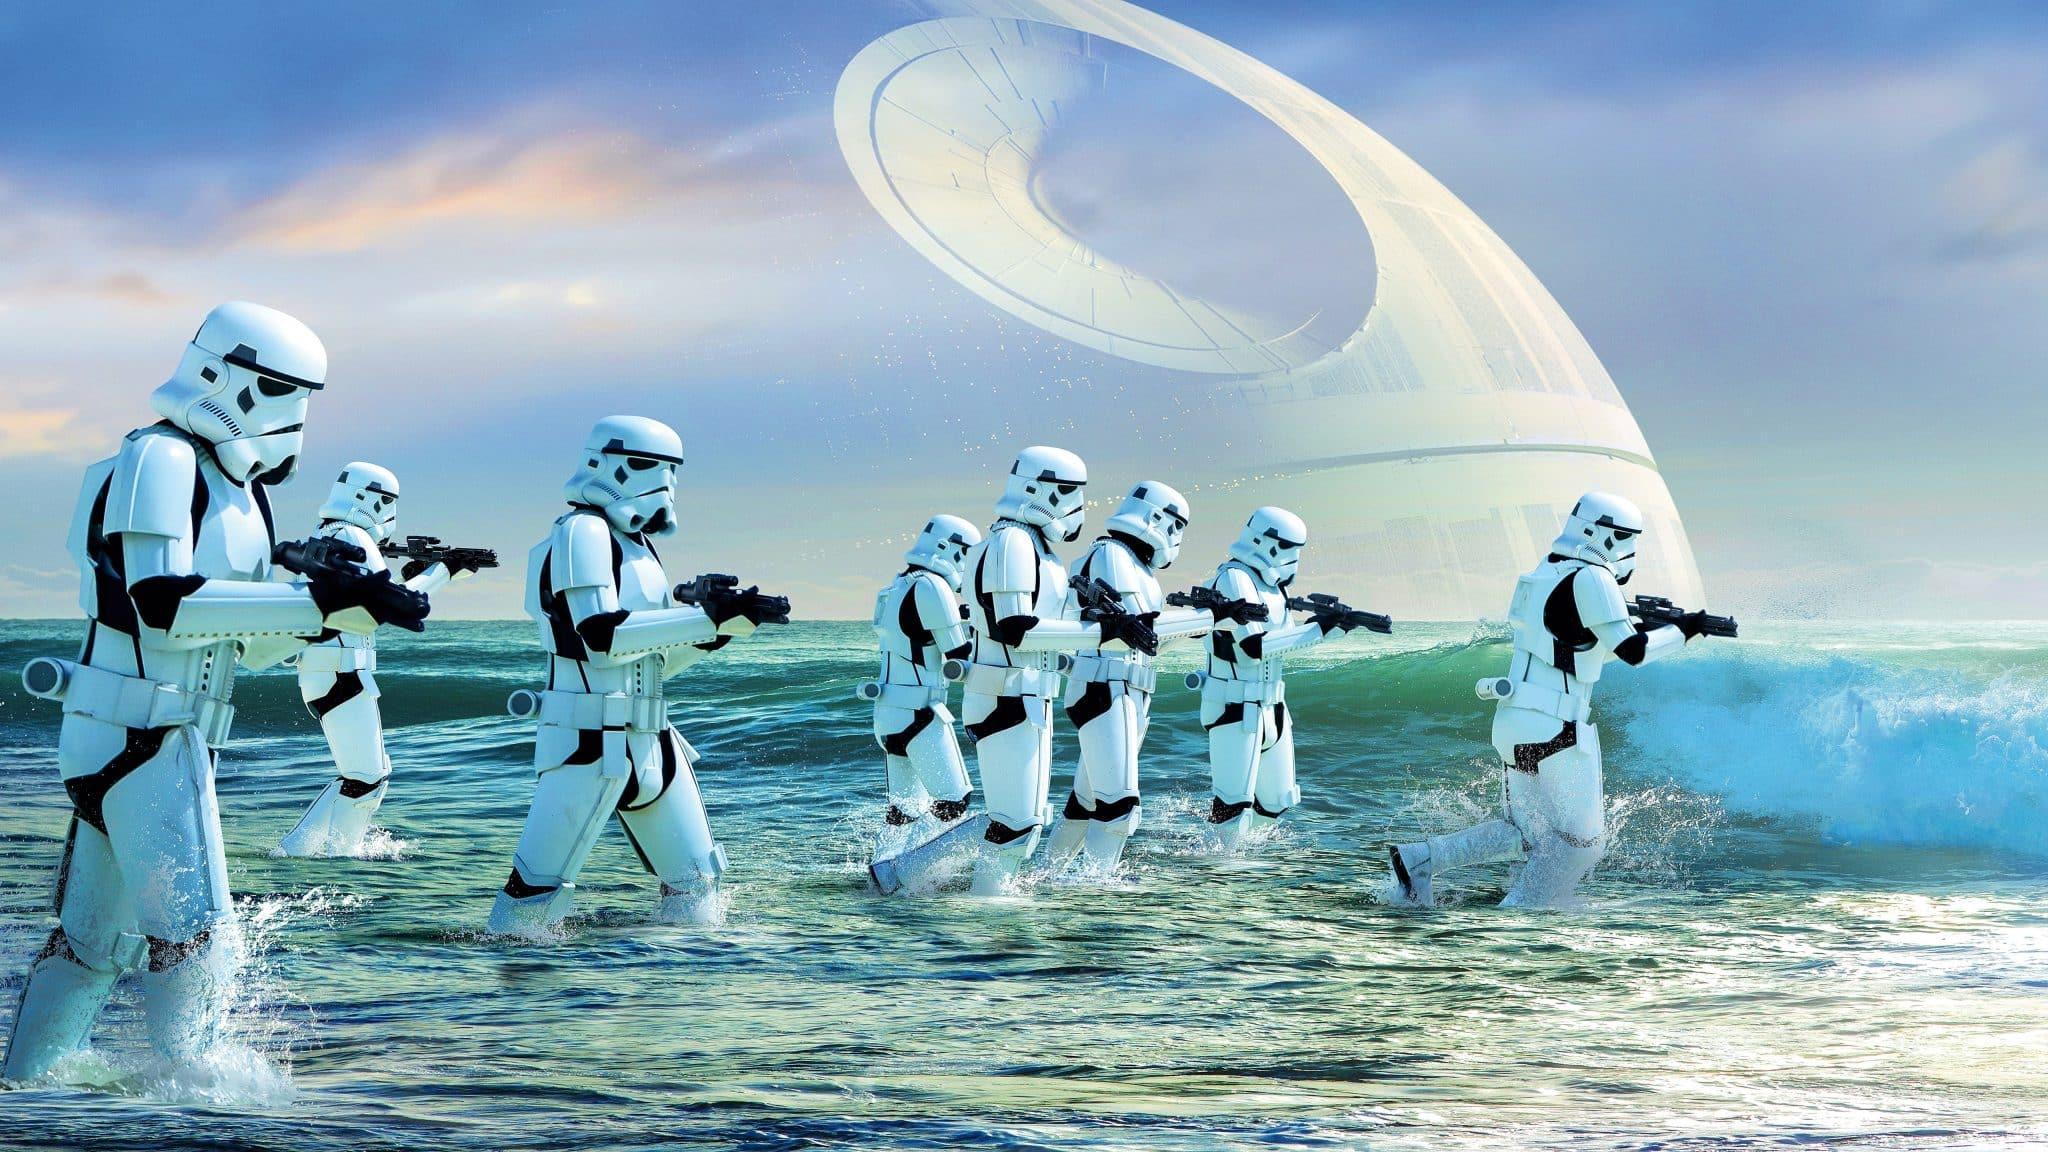 Najlepšie efekty: Rogue One: A Star Wars Story; Zdroj: hdwallpaper.in